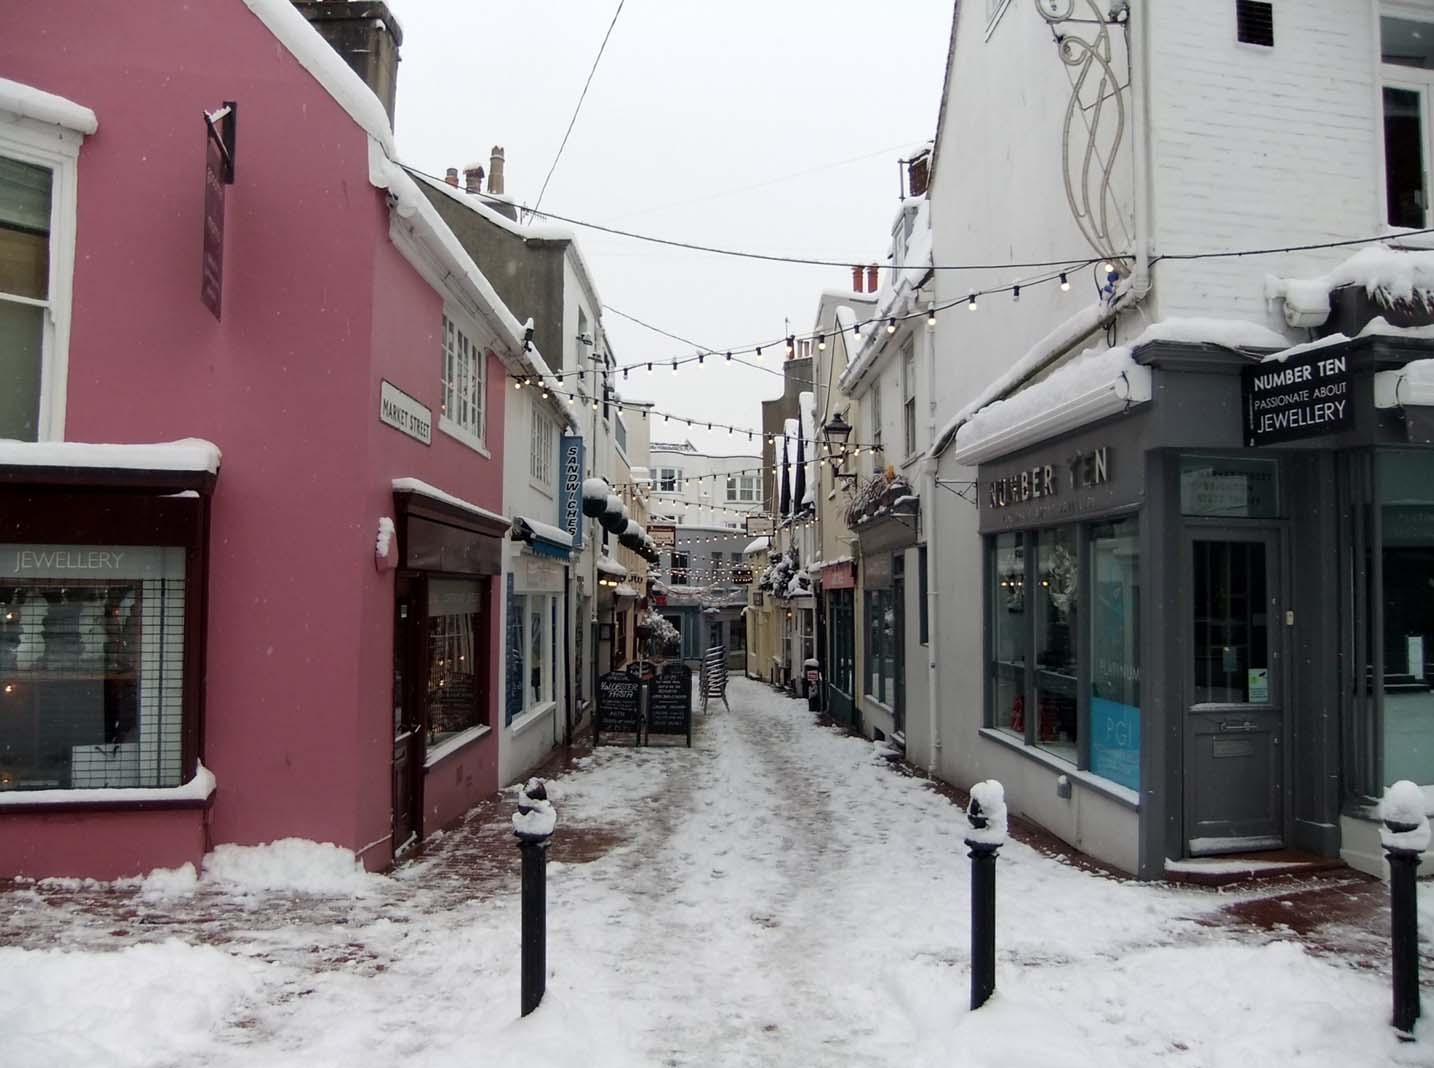 Brighton Lanes winter